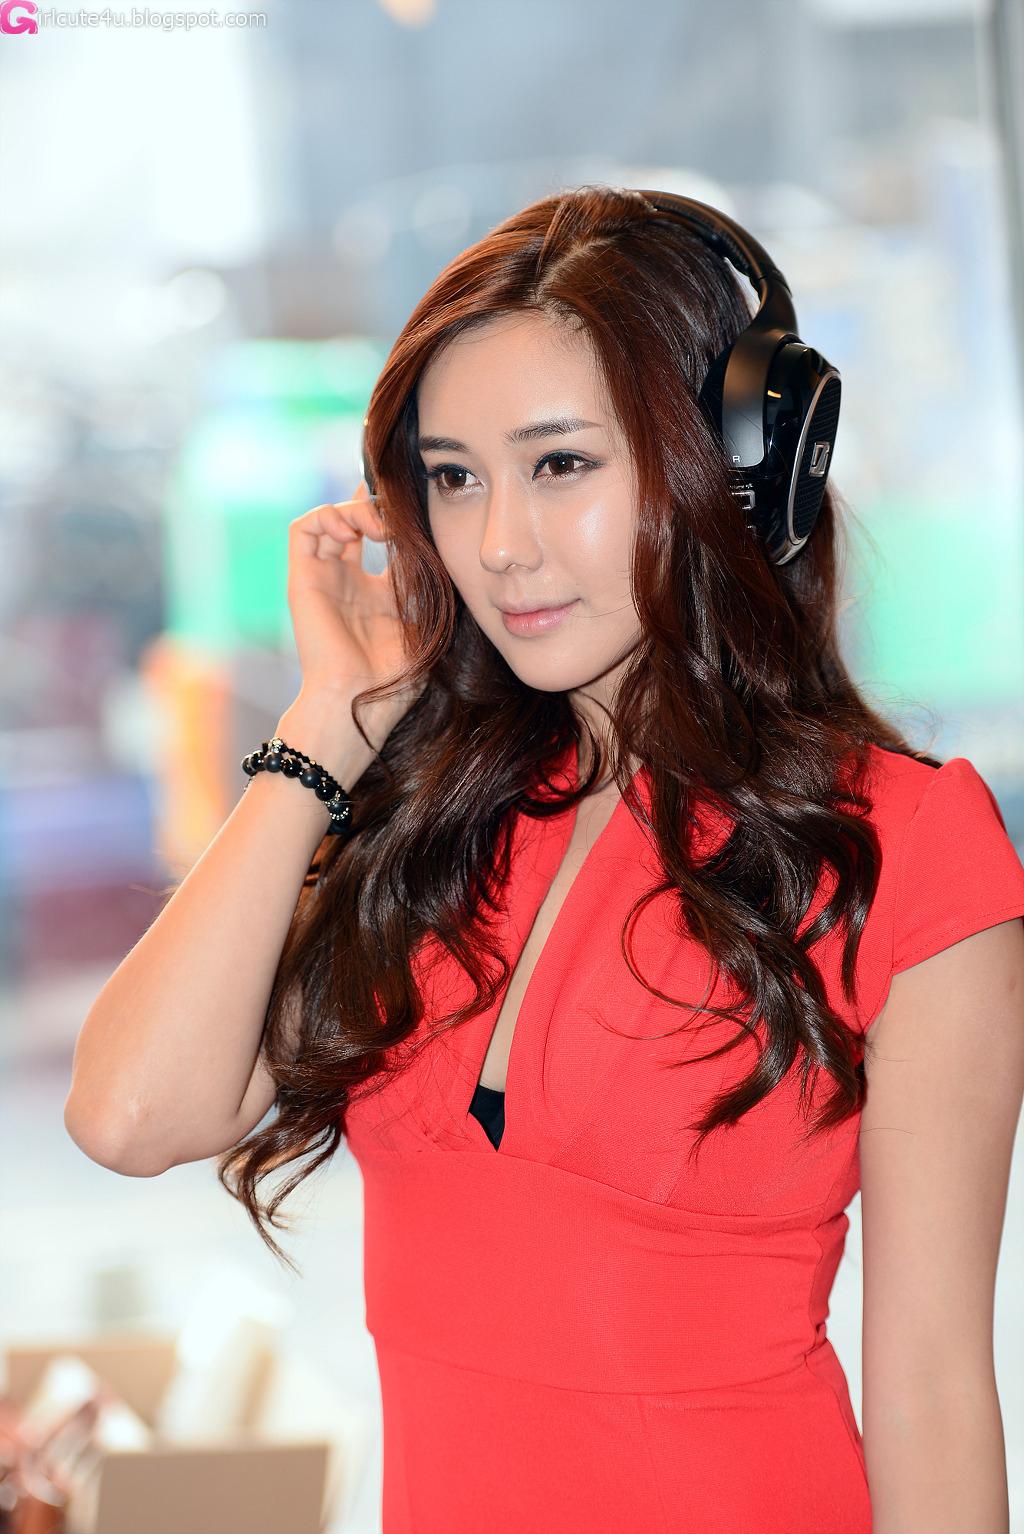 xxx nude girls: Kim Ha Yul - CJ SuperRace 2012 R2